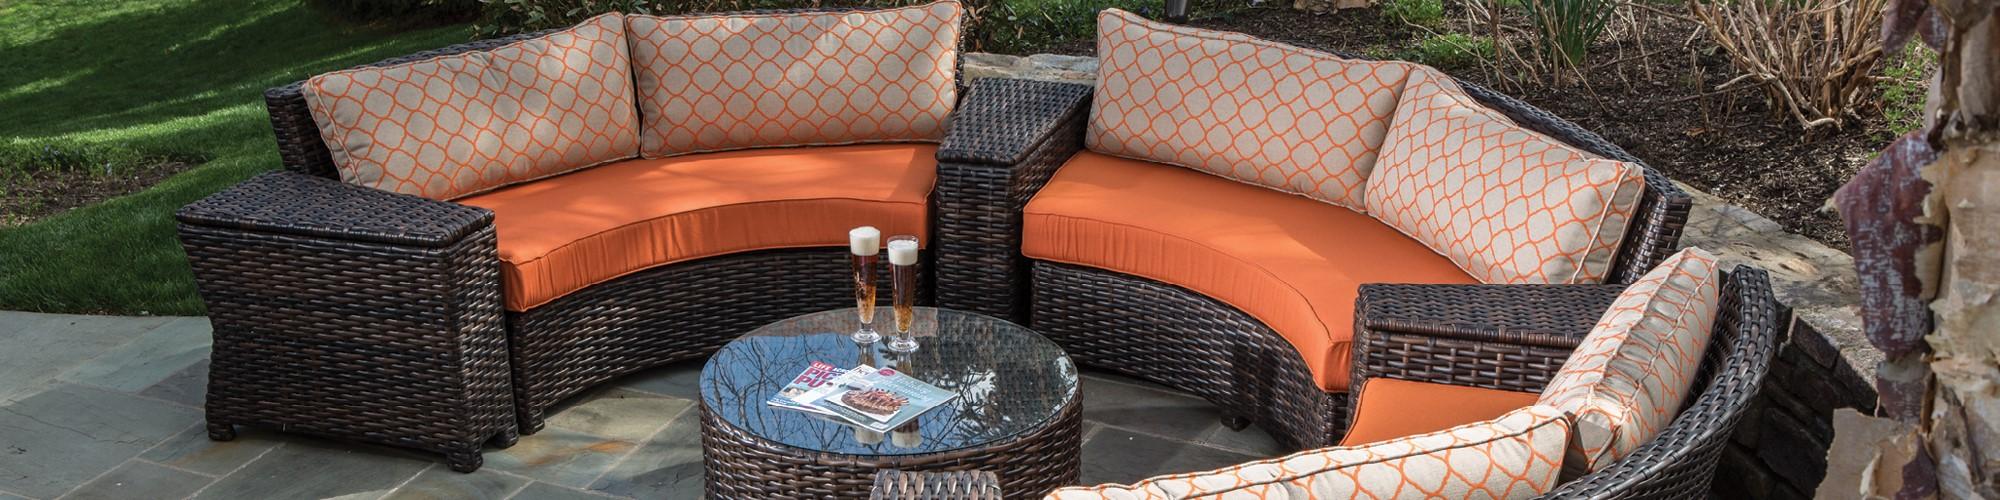 Outdoor furniture in a backyard setting.